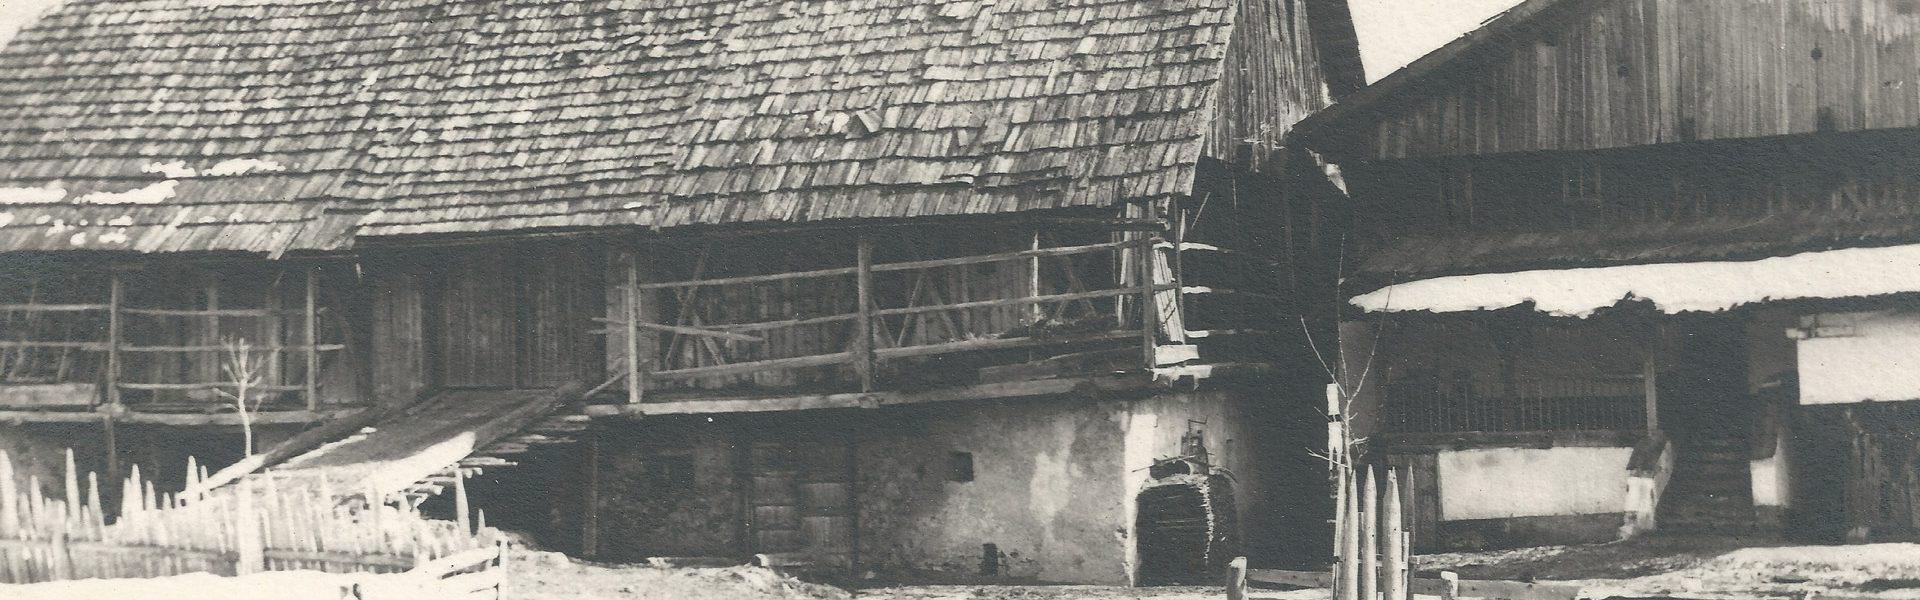 Moarhof-Nordseite-1940